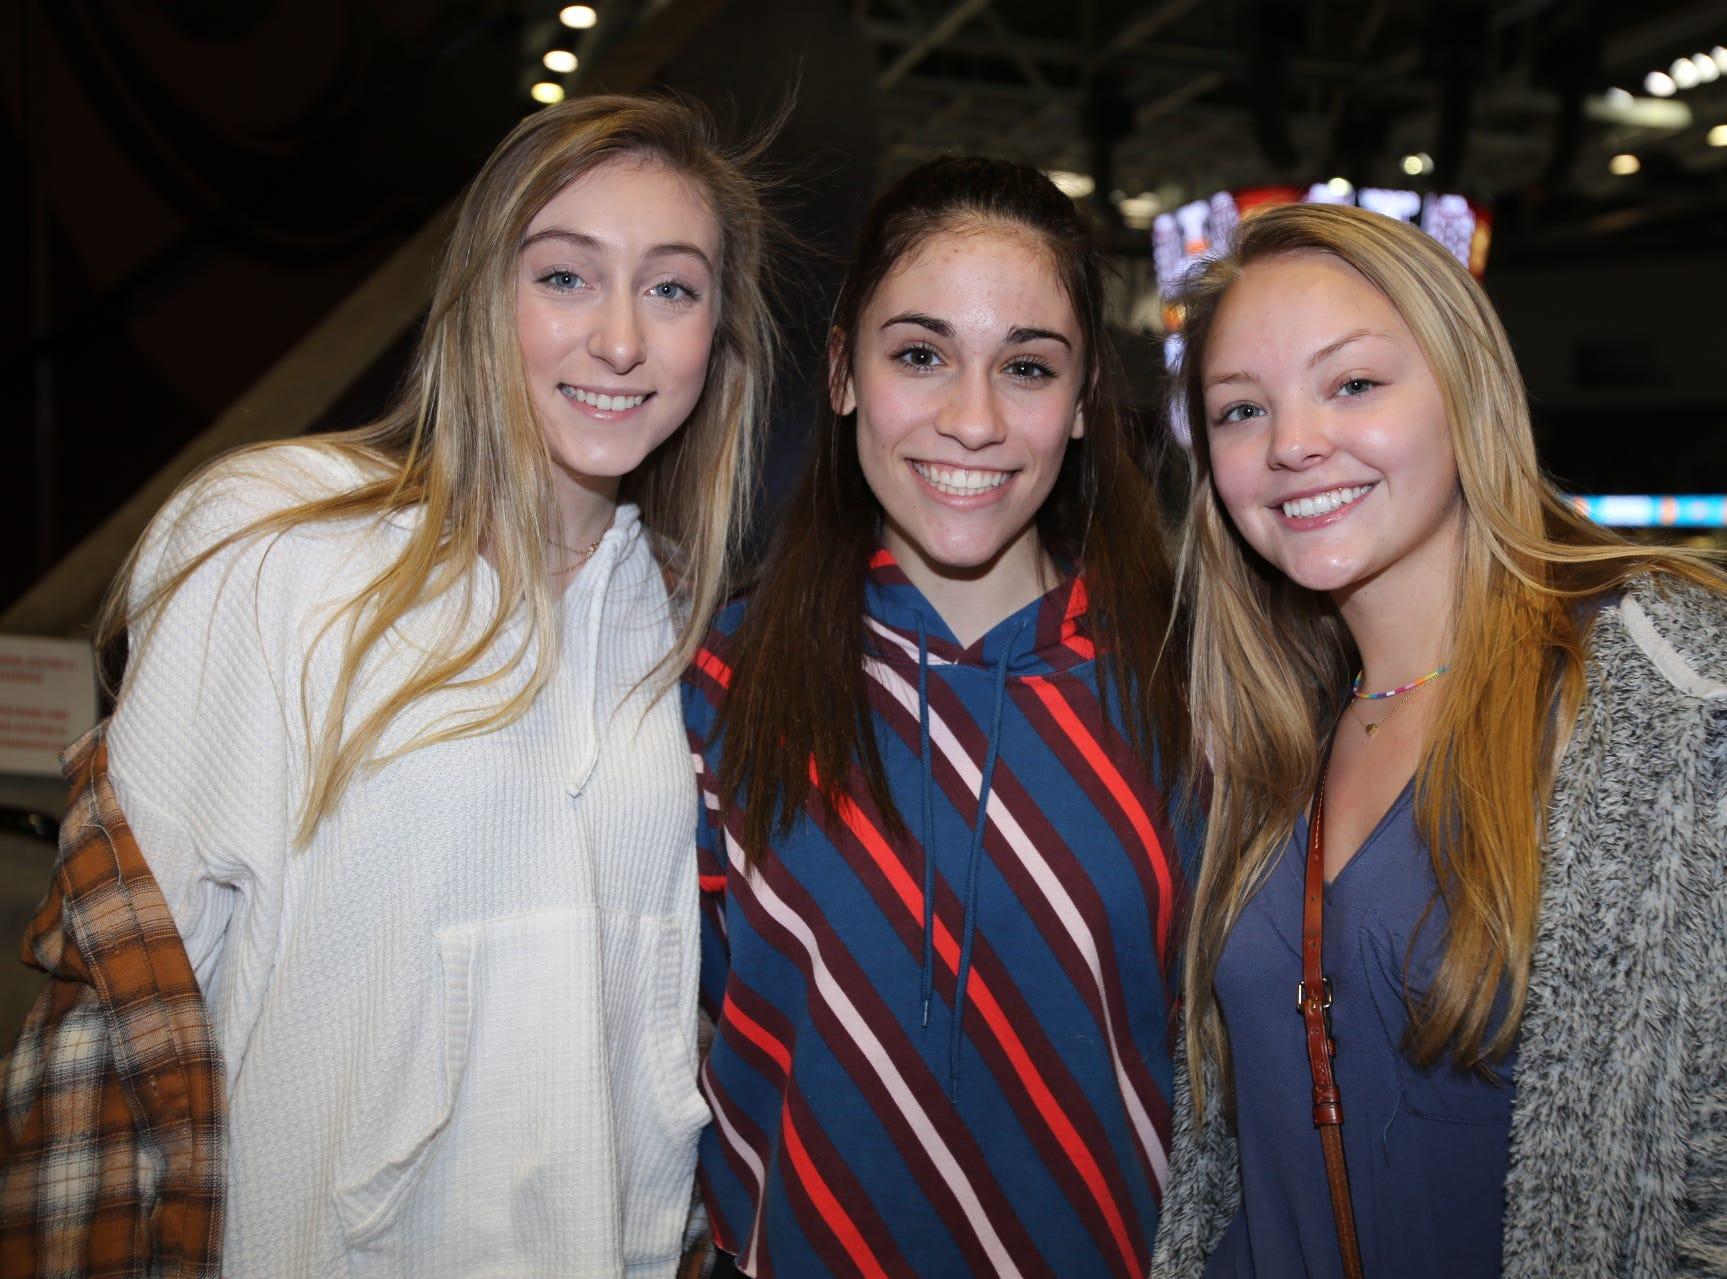 Belle Nau, Lauren Zolfaghri, and Olyvia Brinkmann